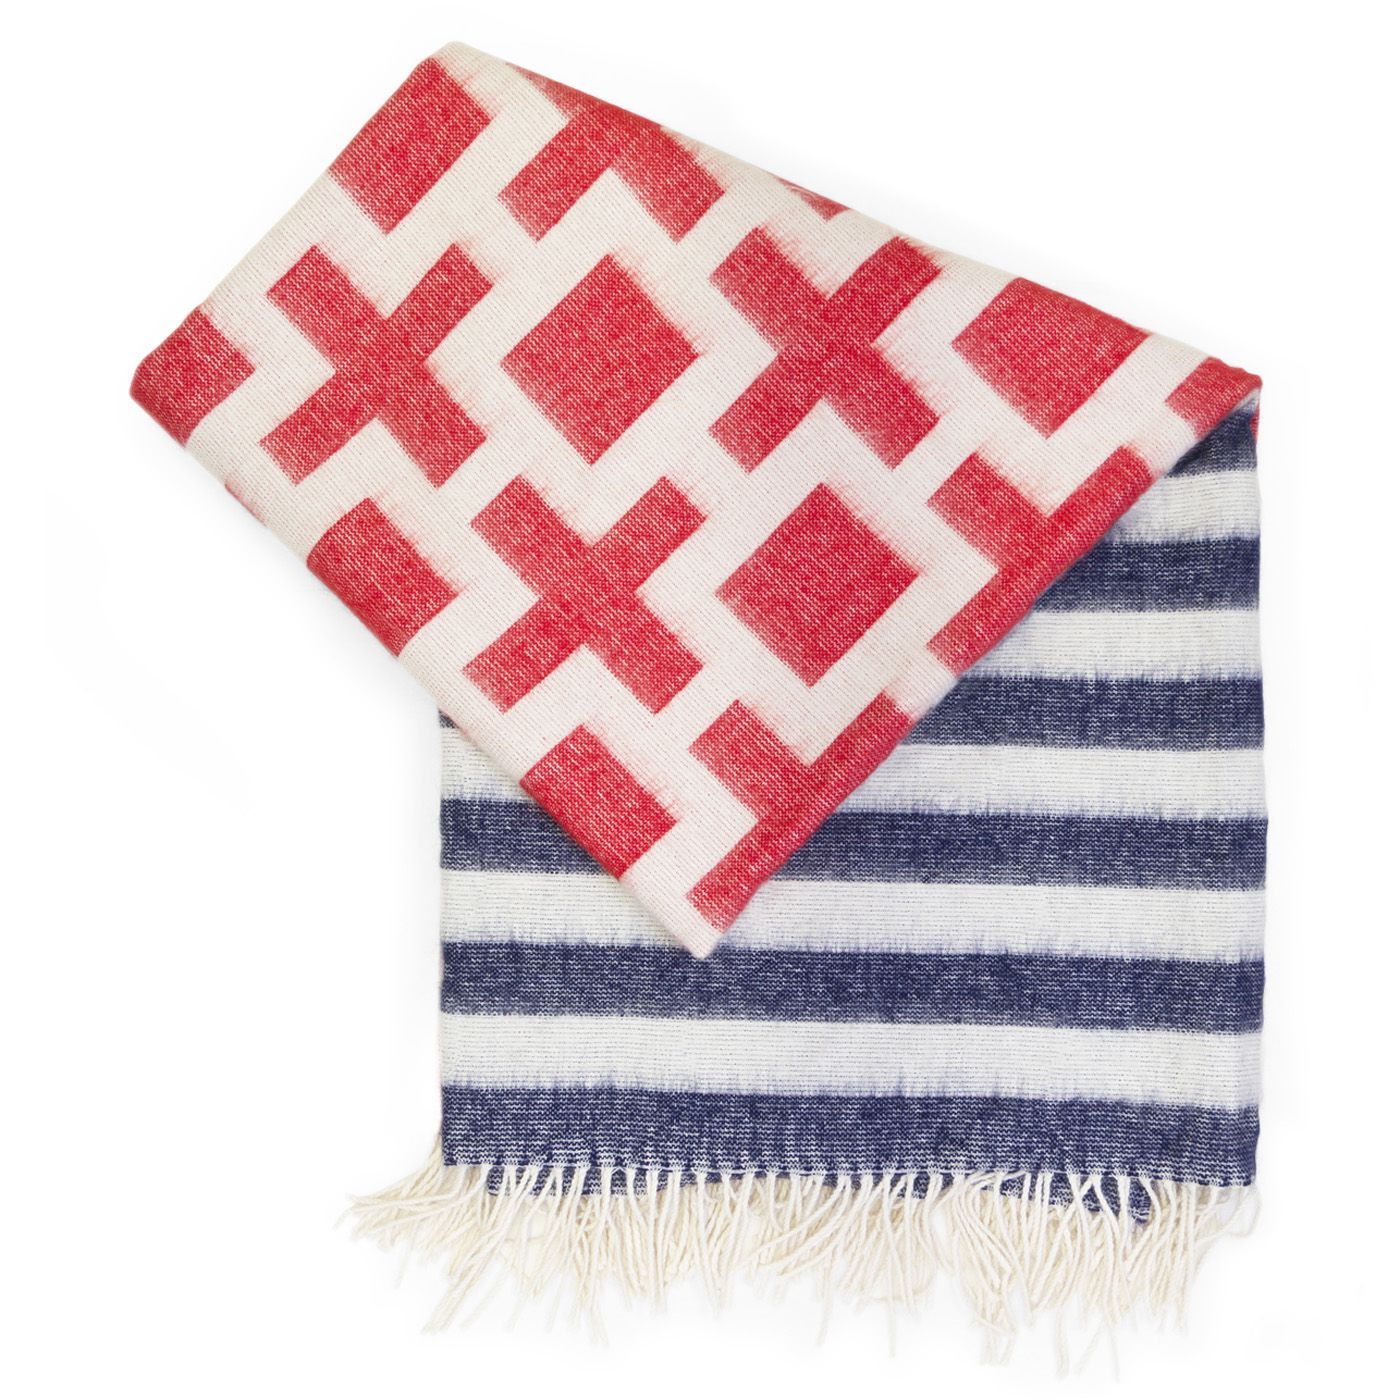 modern blankets  throws  striped richard nixon alpaca throw  - modern blankets  throws  striped richard nixon alpaca throw  jonathanadler